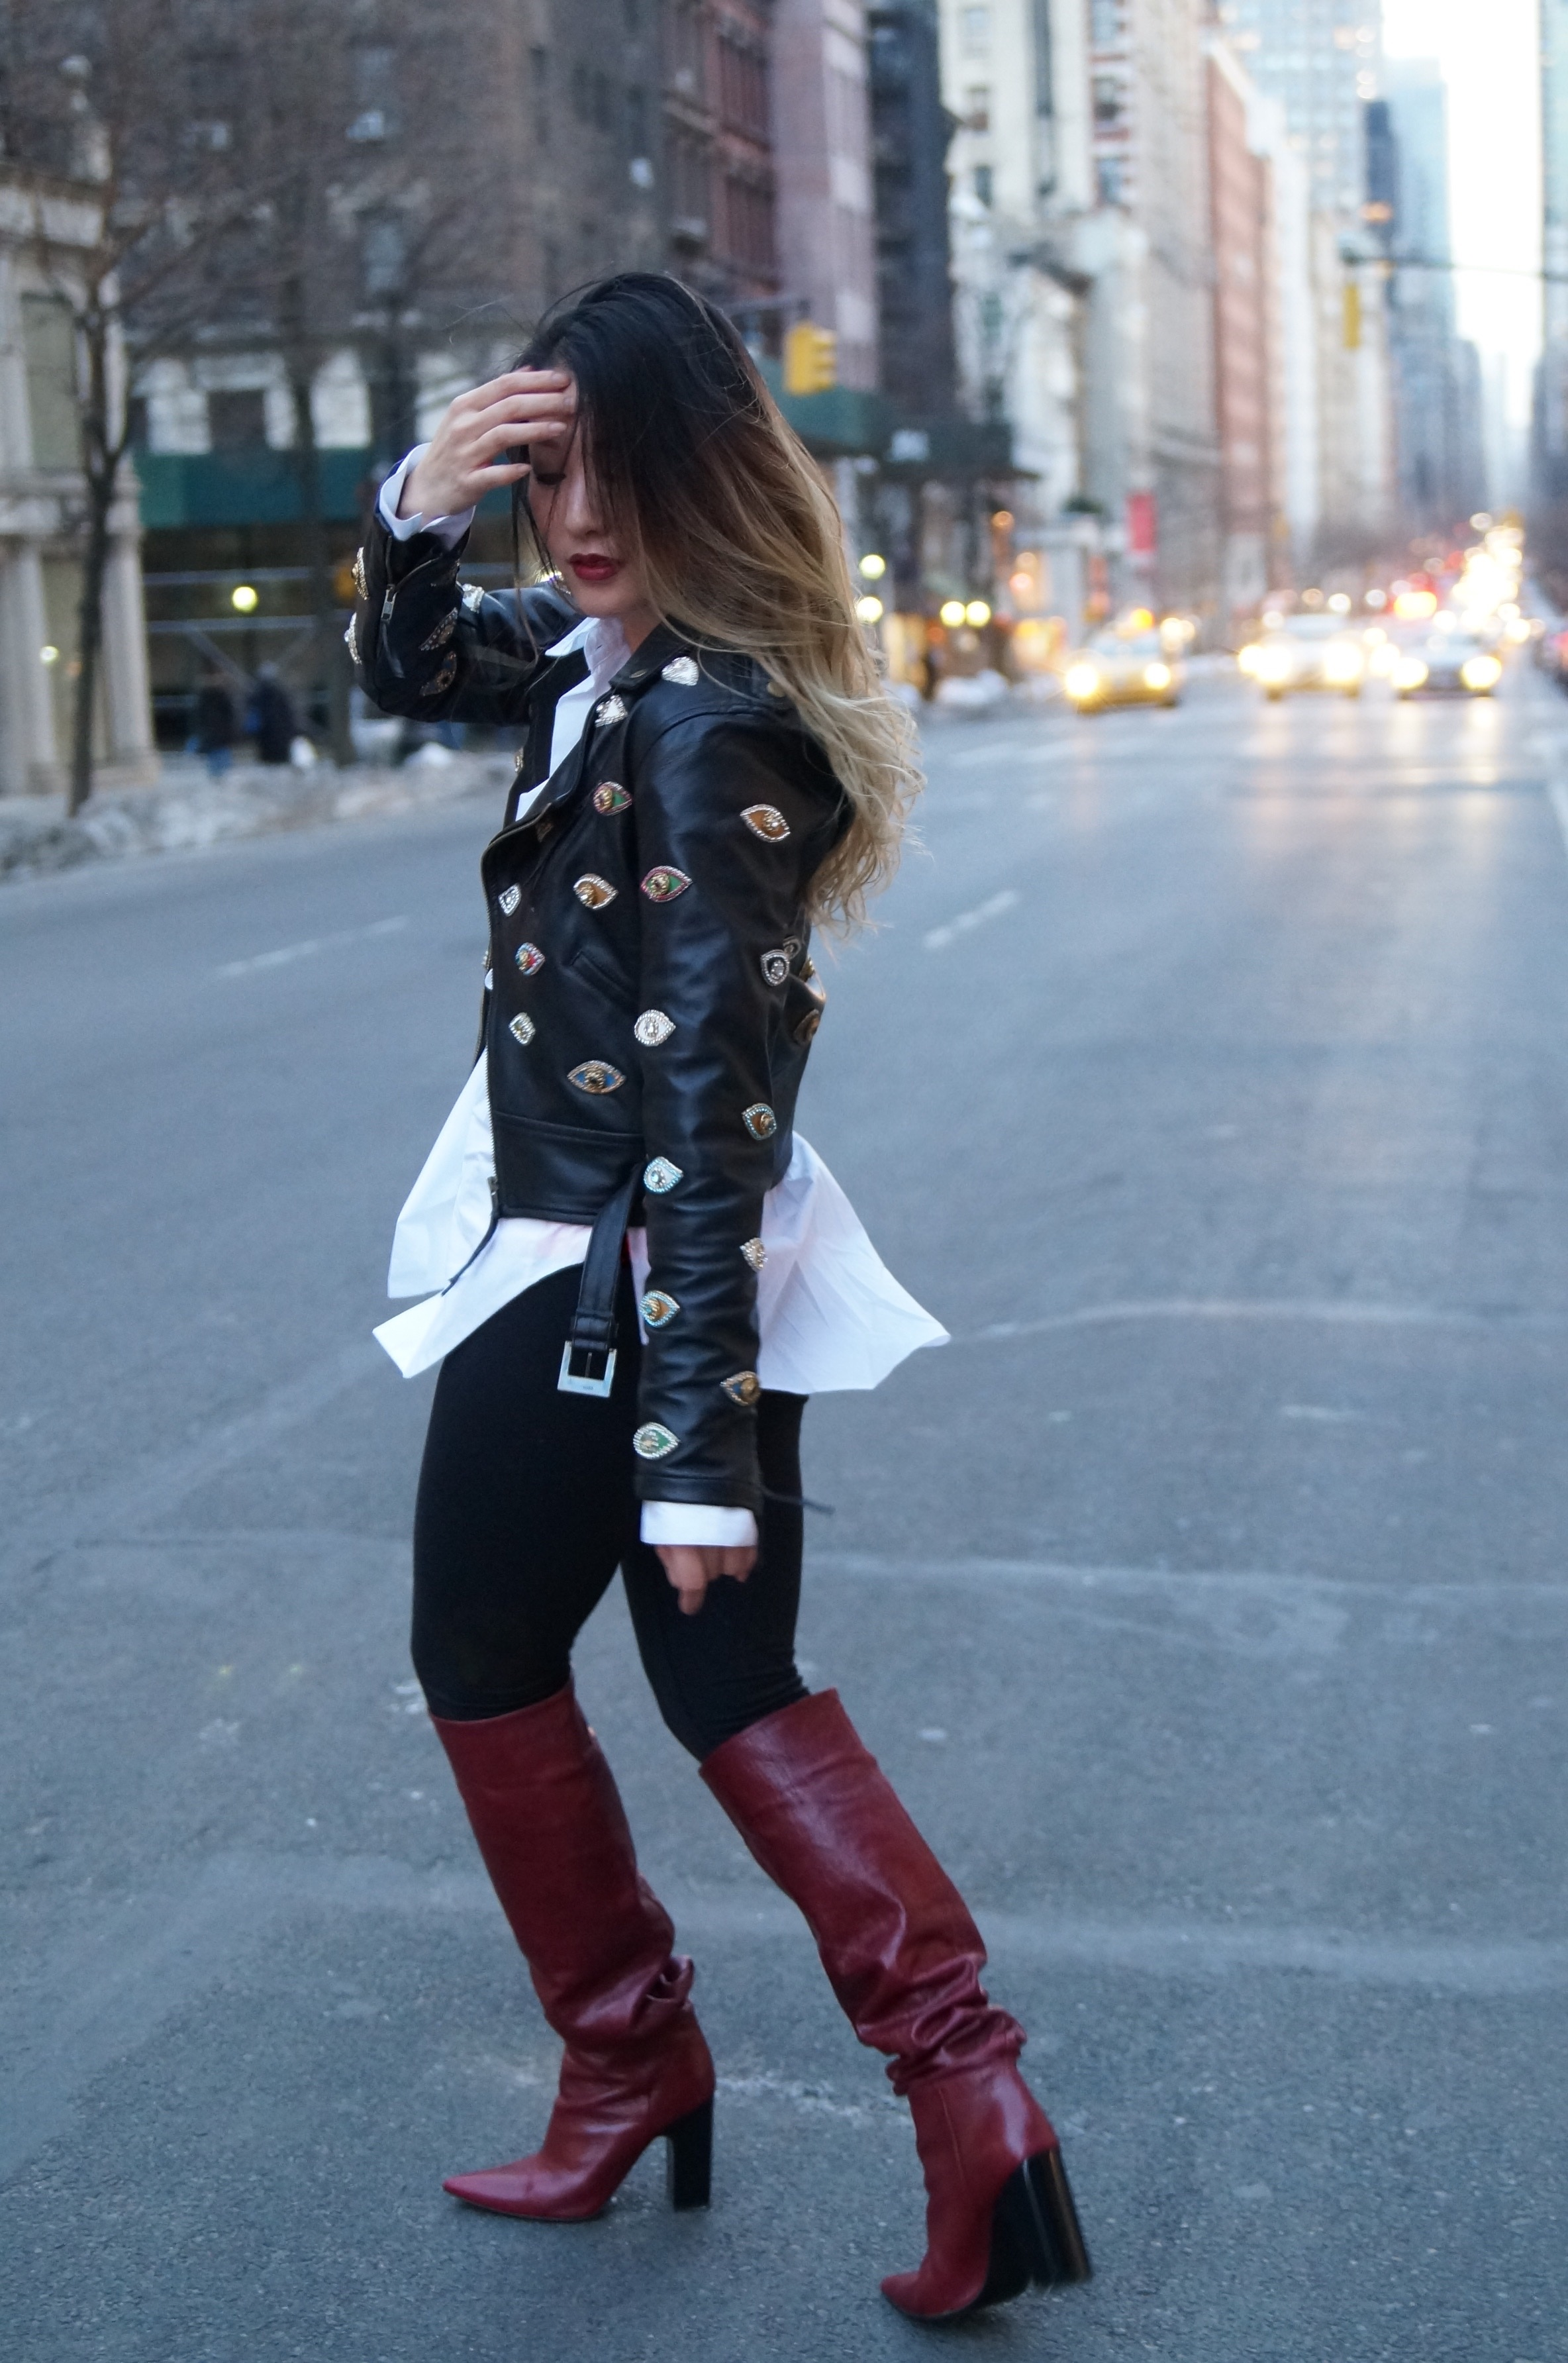 leatherjacket_embellished_evileye4.JPG